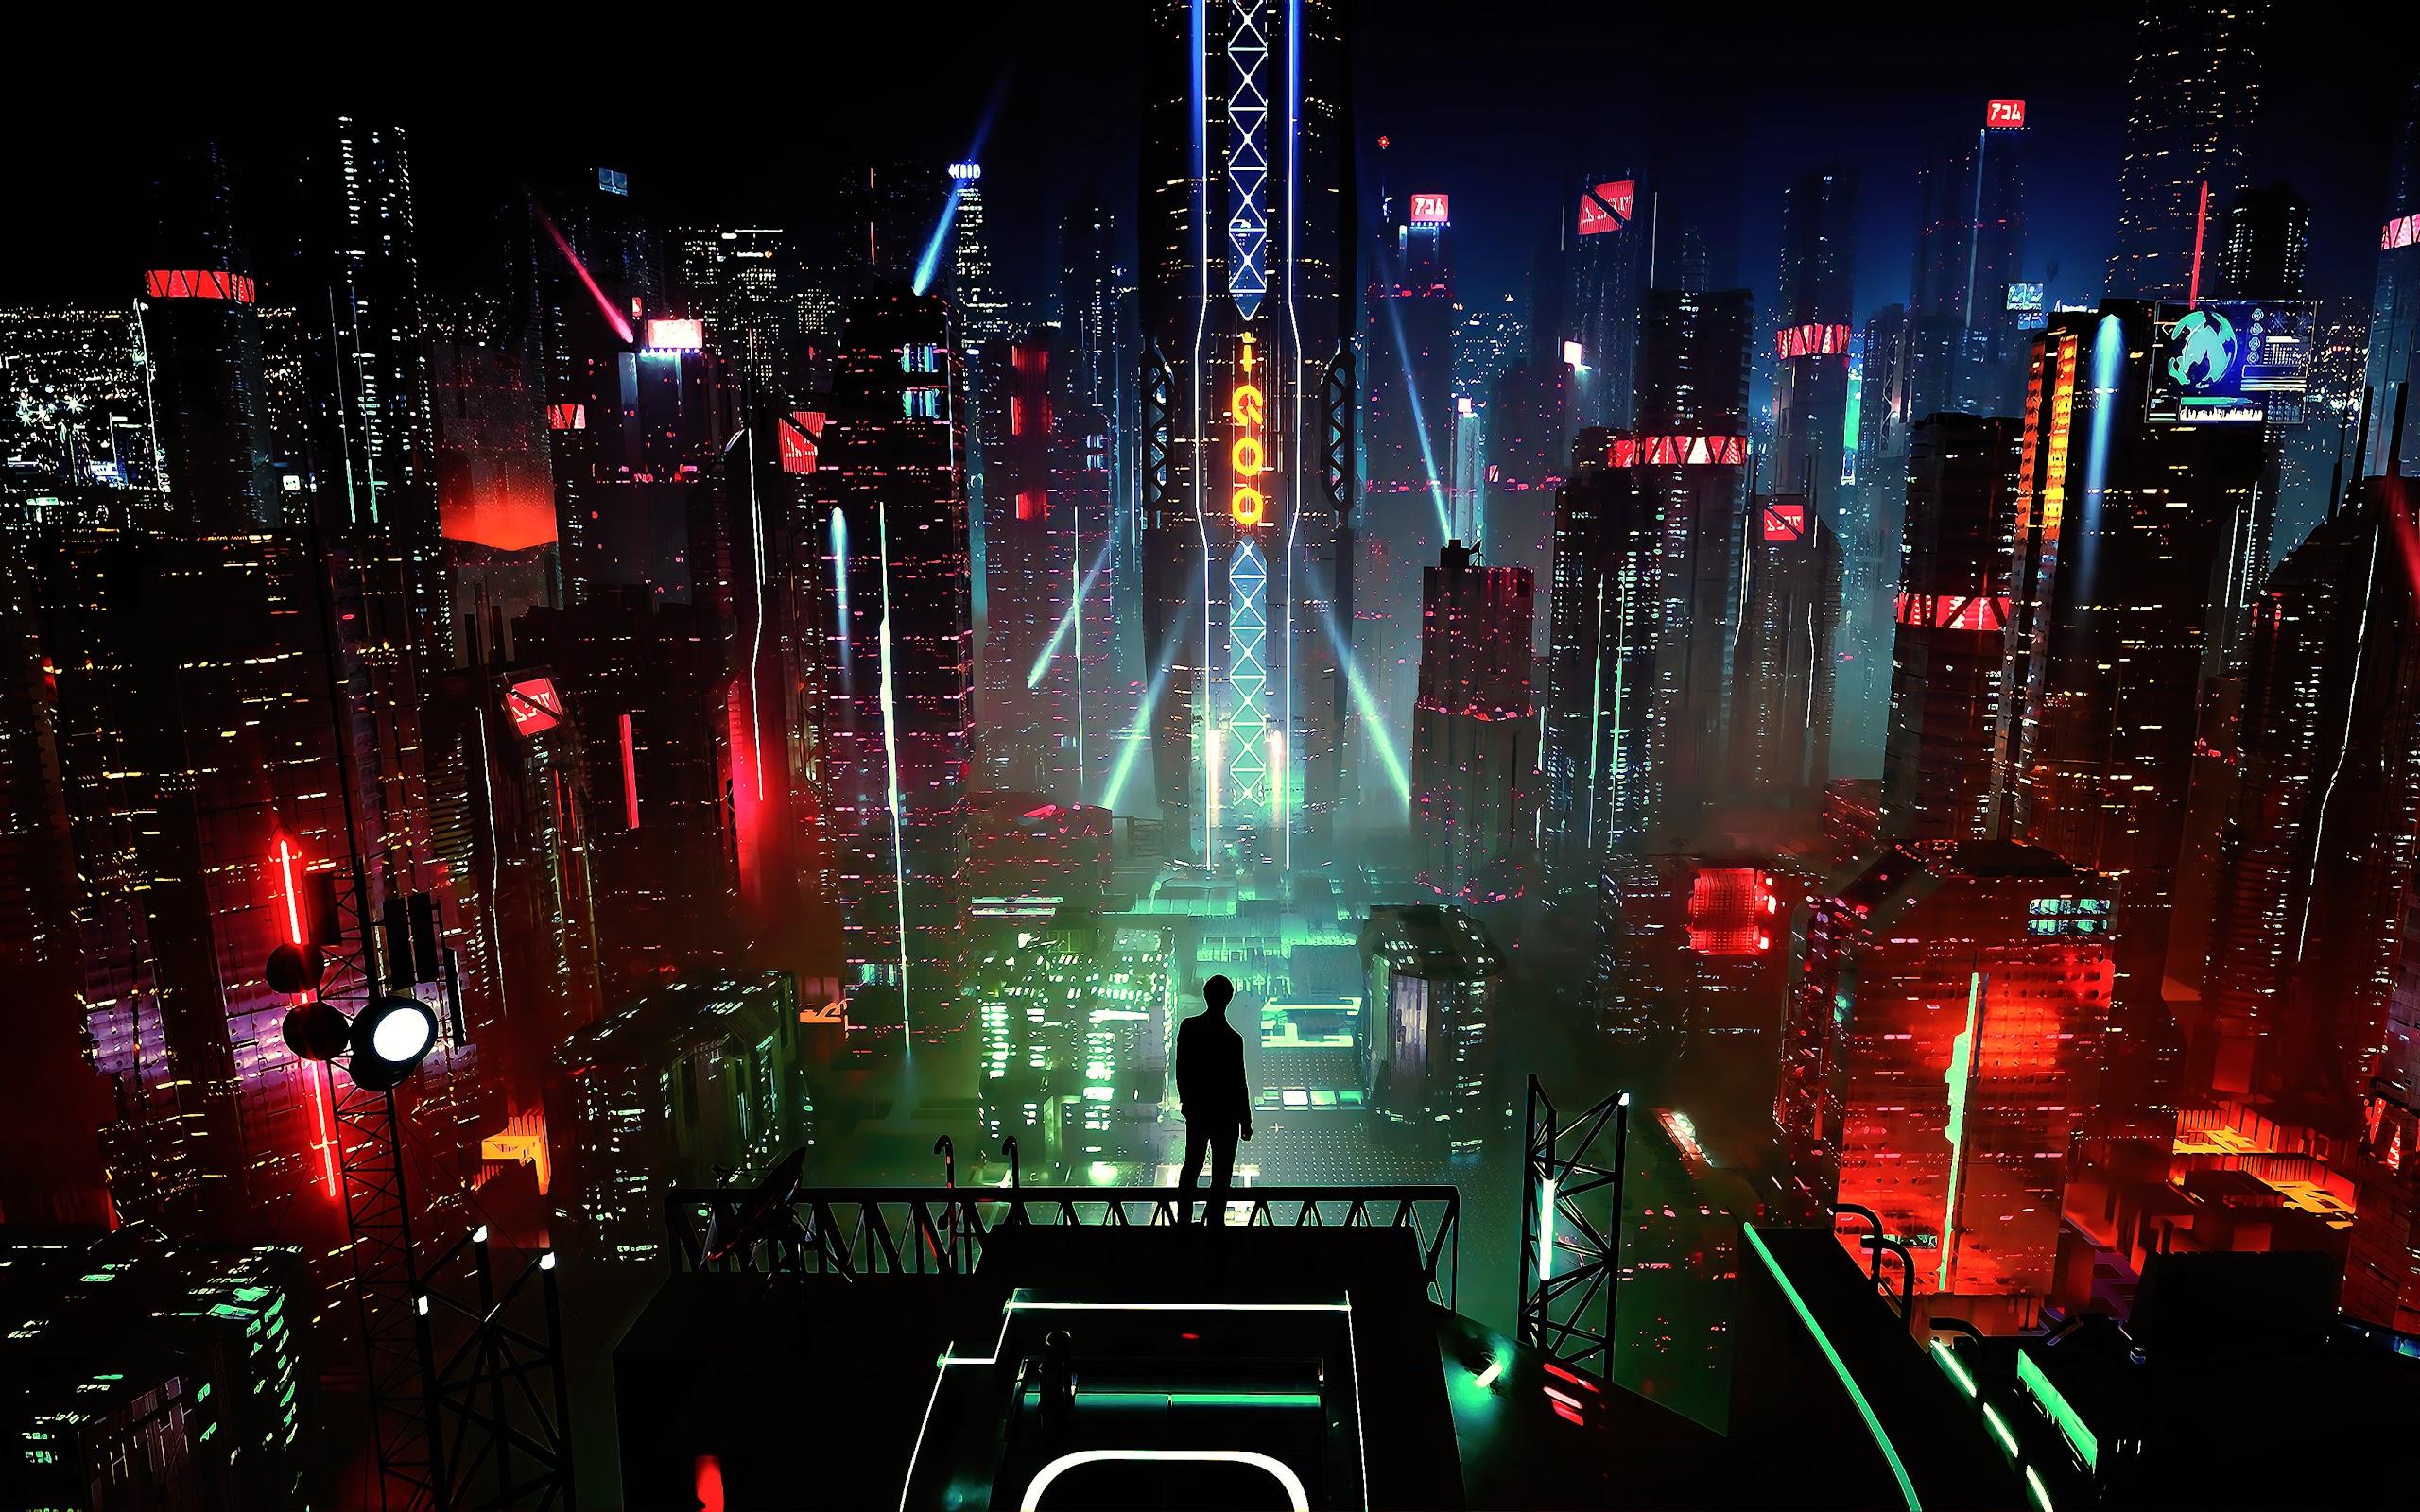 Sci Fi Night City Cityscape Buildings Digital Art 4k